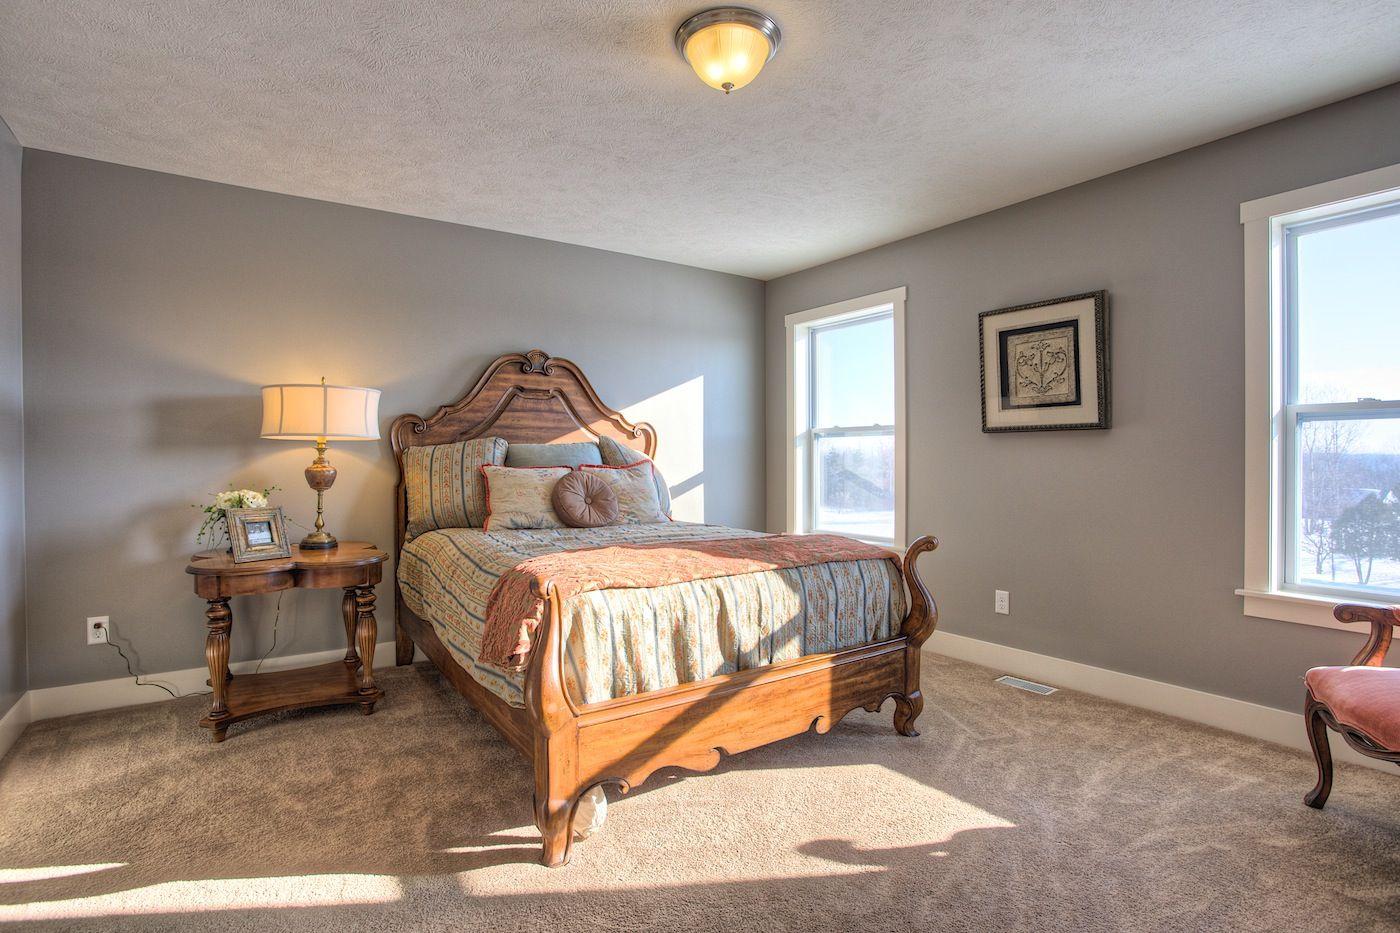 Bedroom featured in the Elements 1870 By Allen Edwin Homes in Grand Rapids, MI